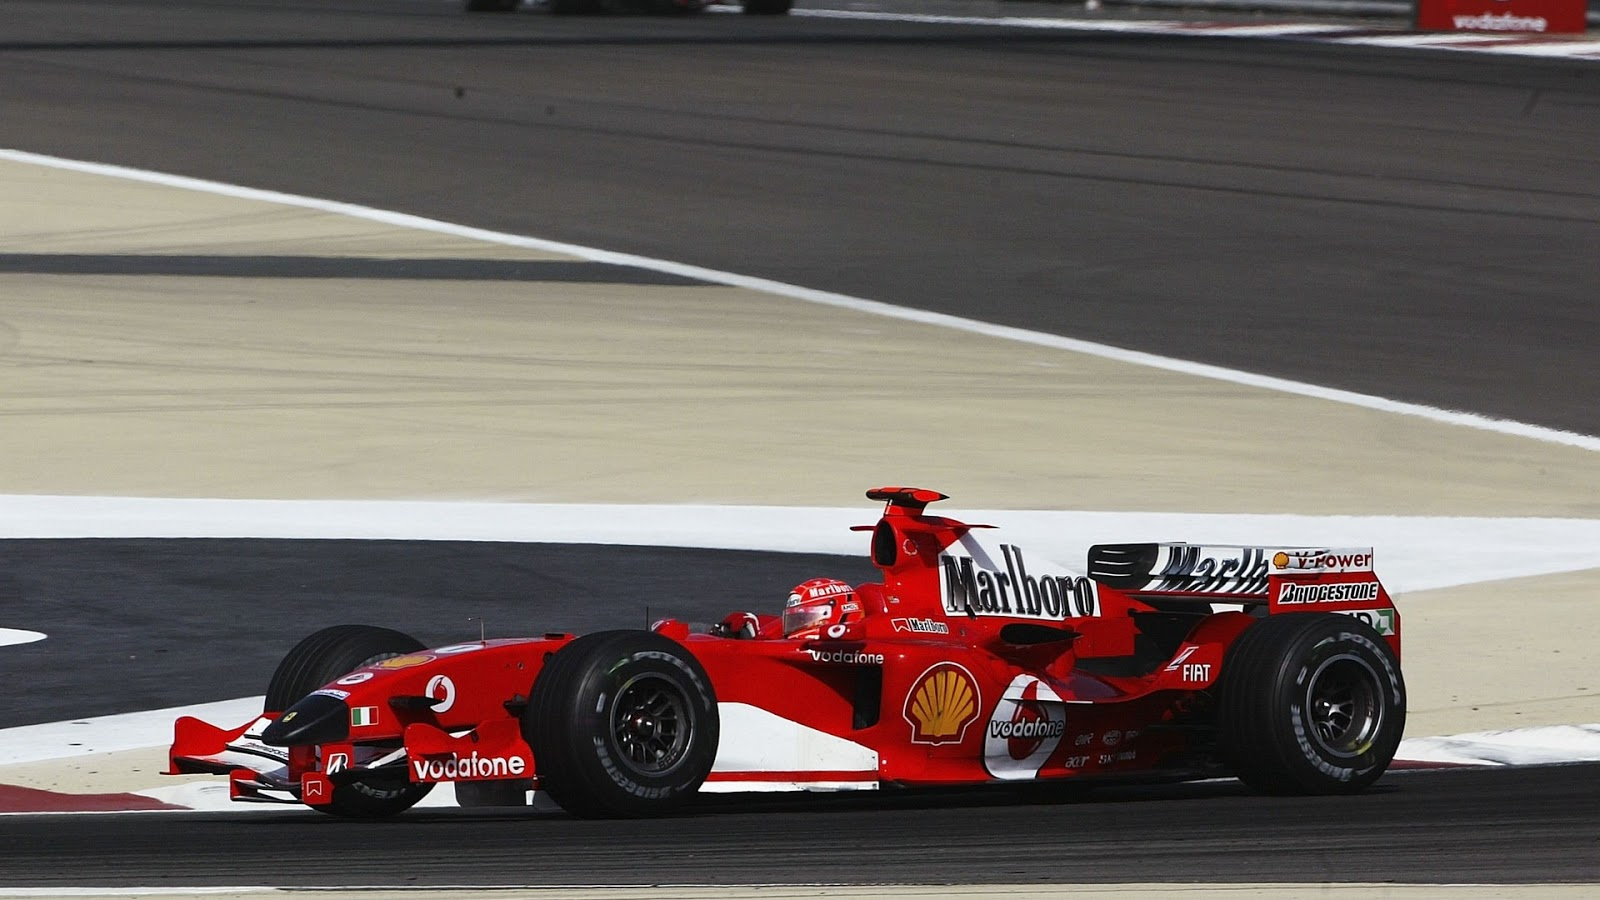 F1-+F2005+Bahrain+F1+GPjpg.jpg